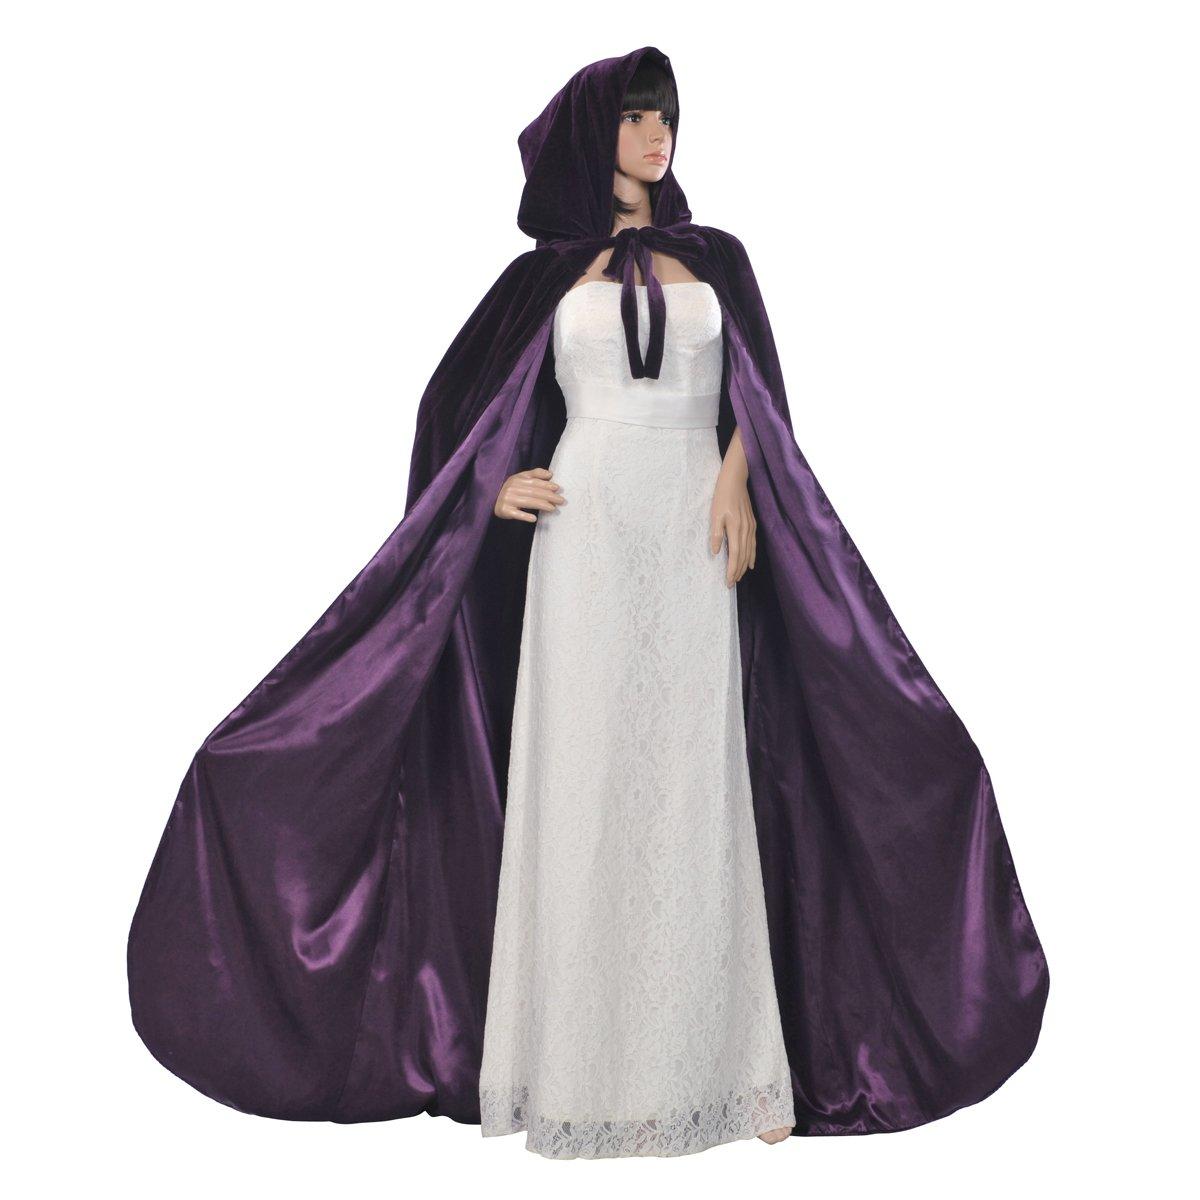 AW Gothic/Medieval Hooded Cloak Long Velvet Cape for Wedding Halloween Cosplay Christmas Custumes, Grape, XXL